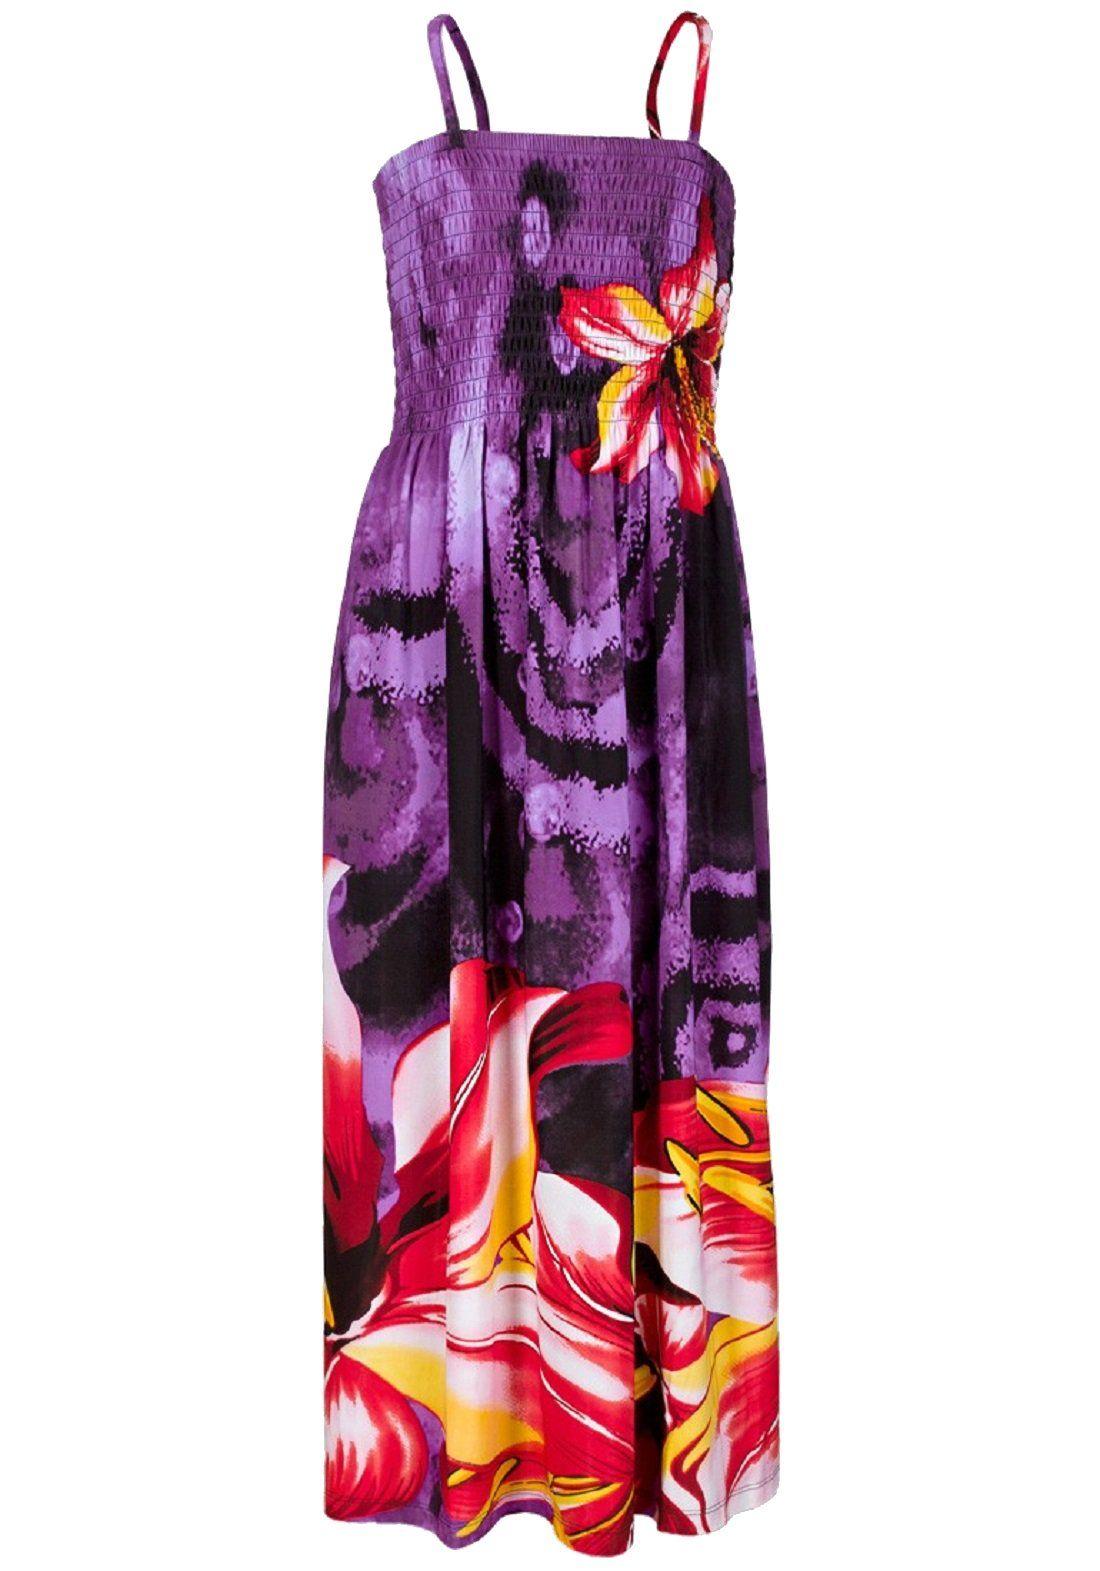 Cristina love girls strappy floral dress age 7891011